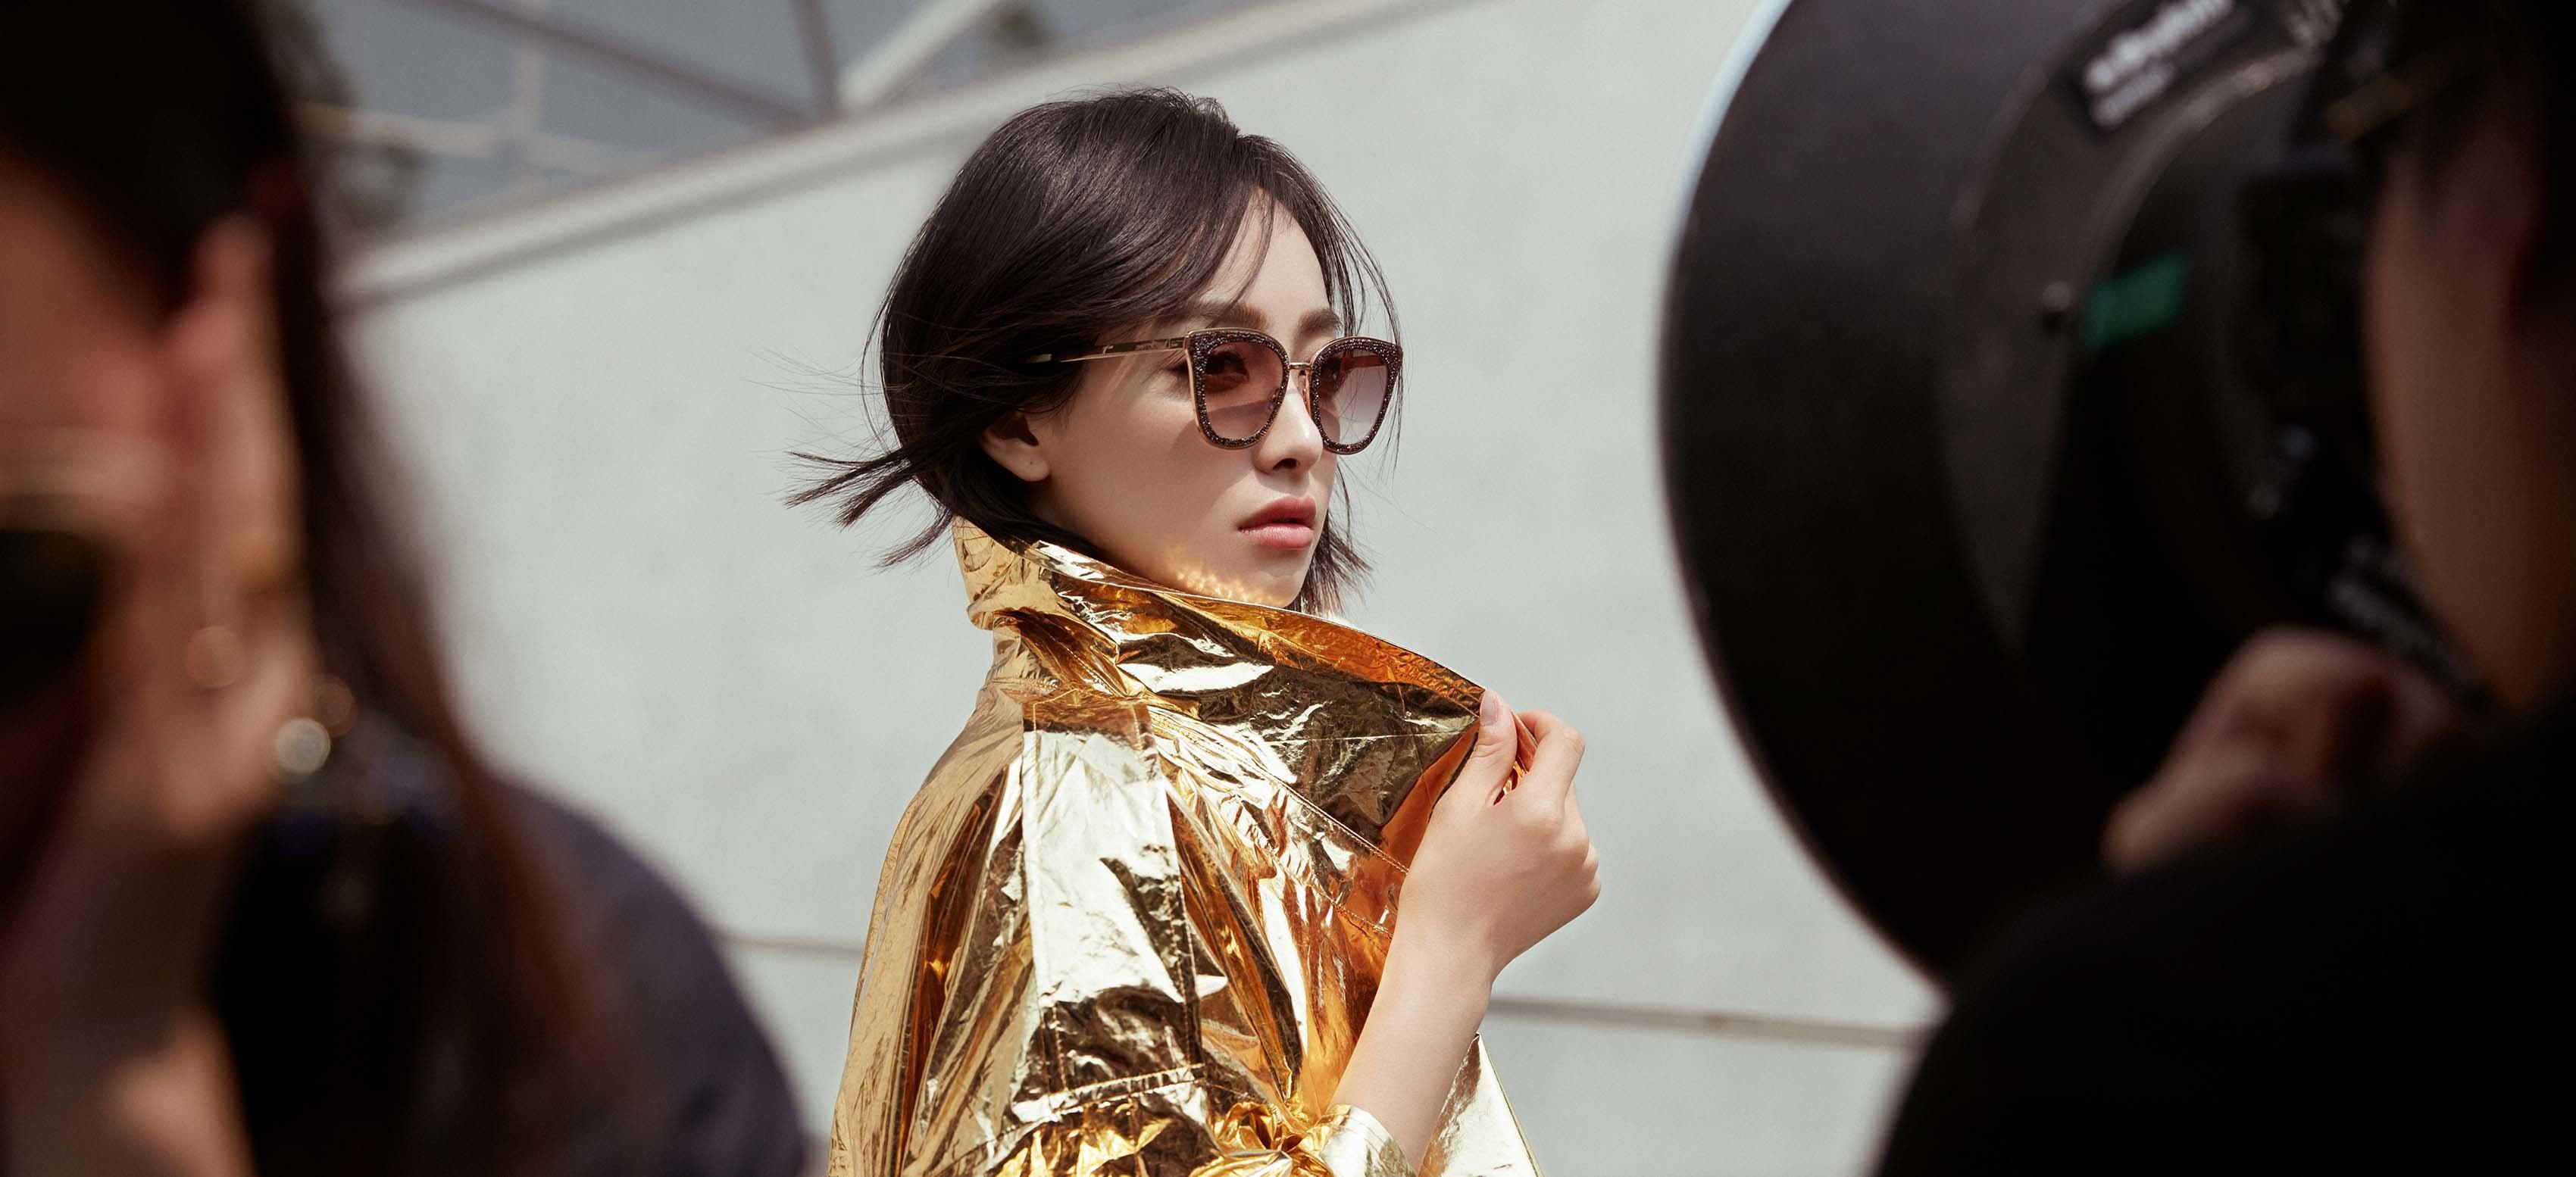 Jimmy Choo announces Asia Brand Ambassador